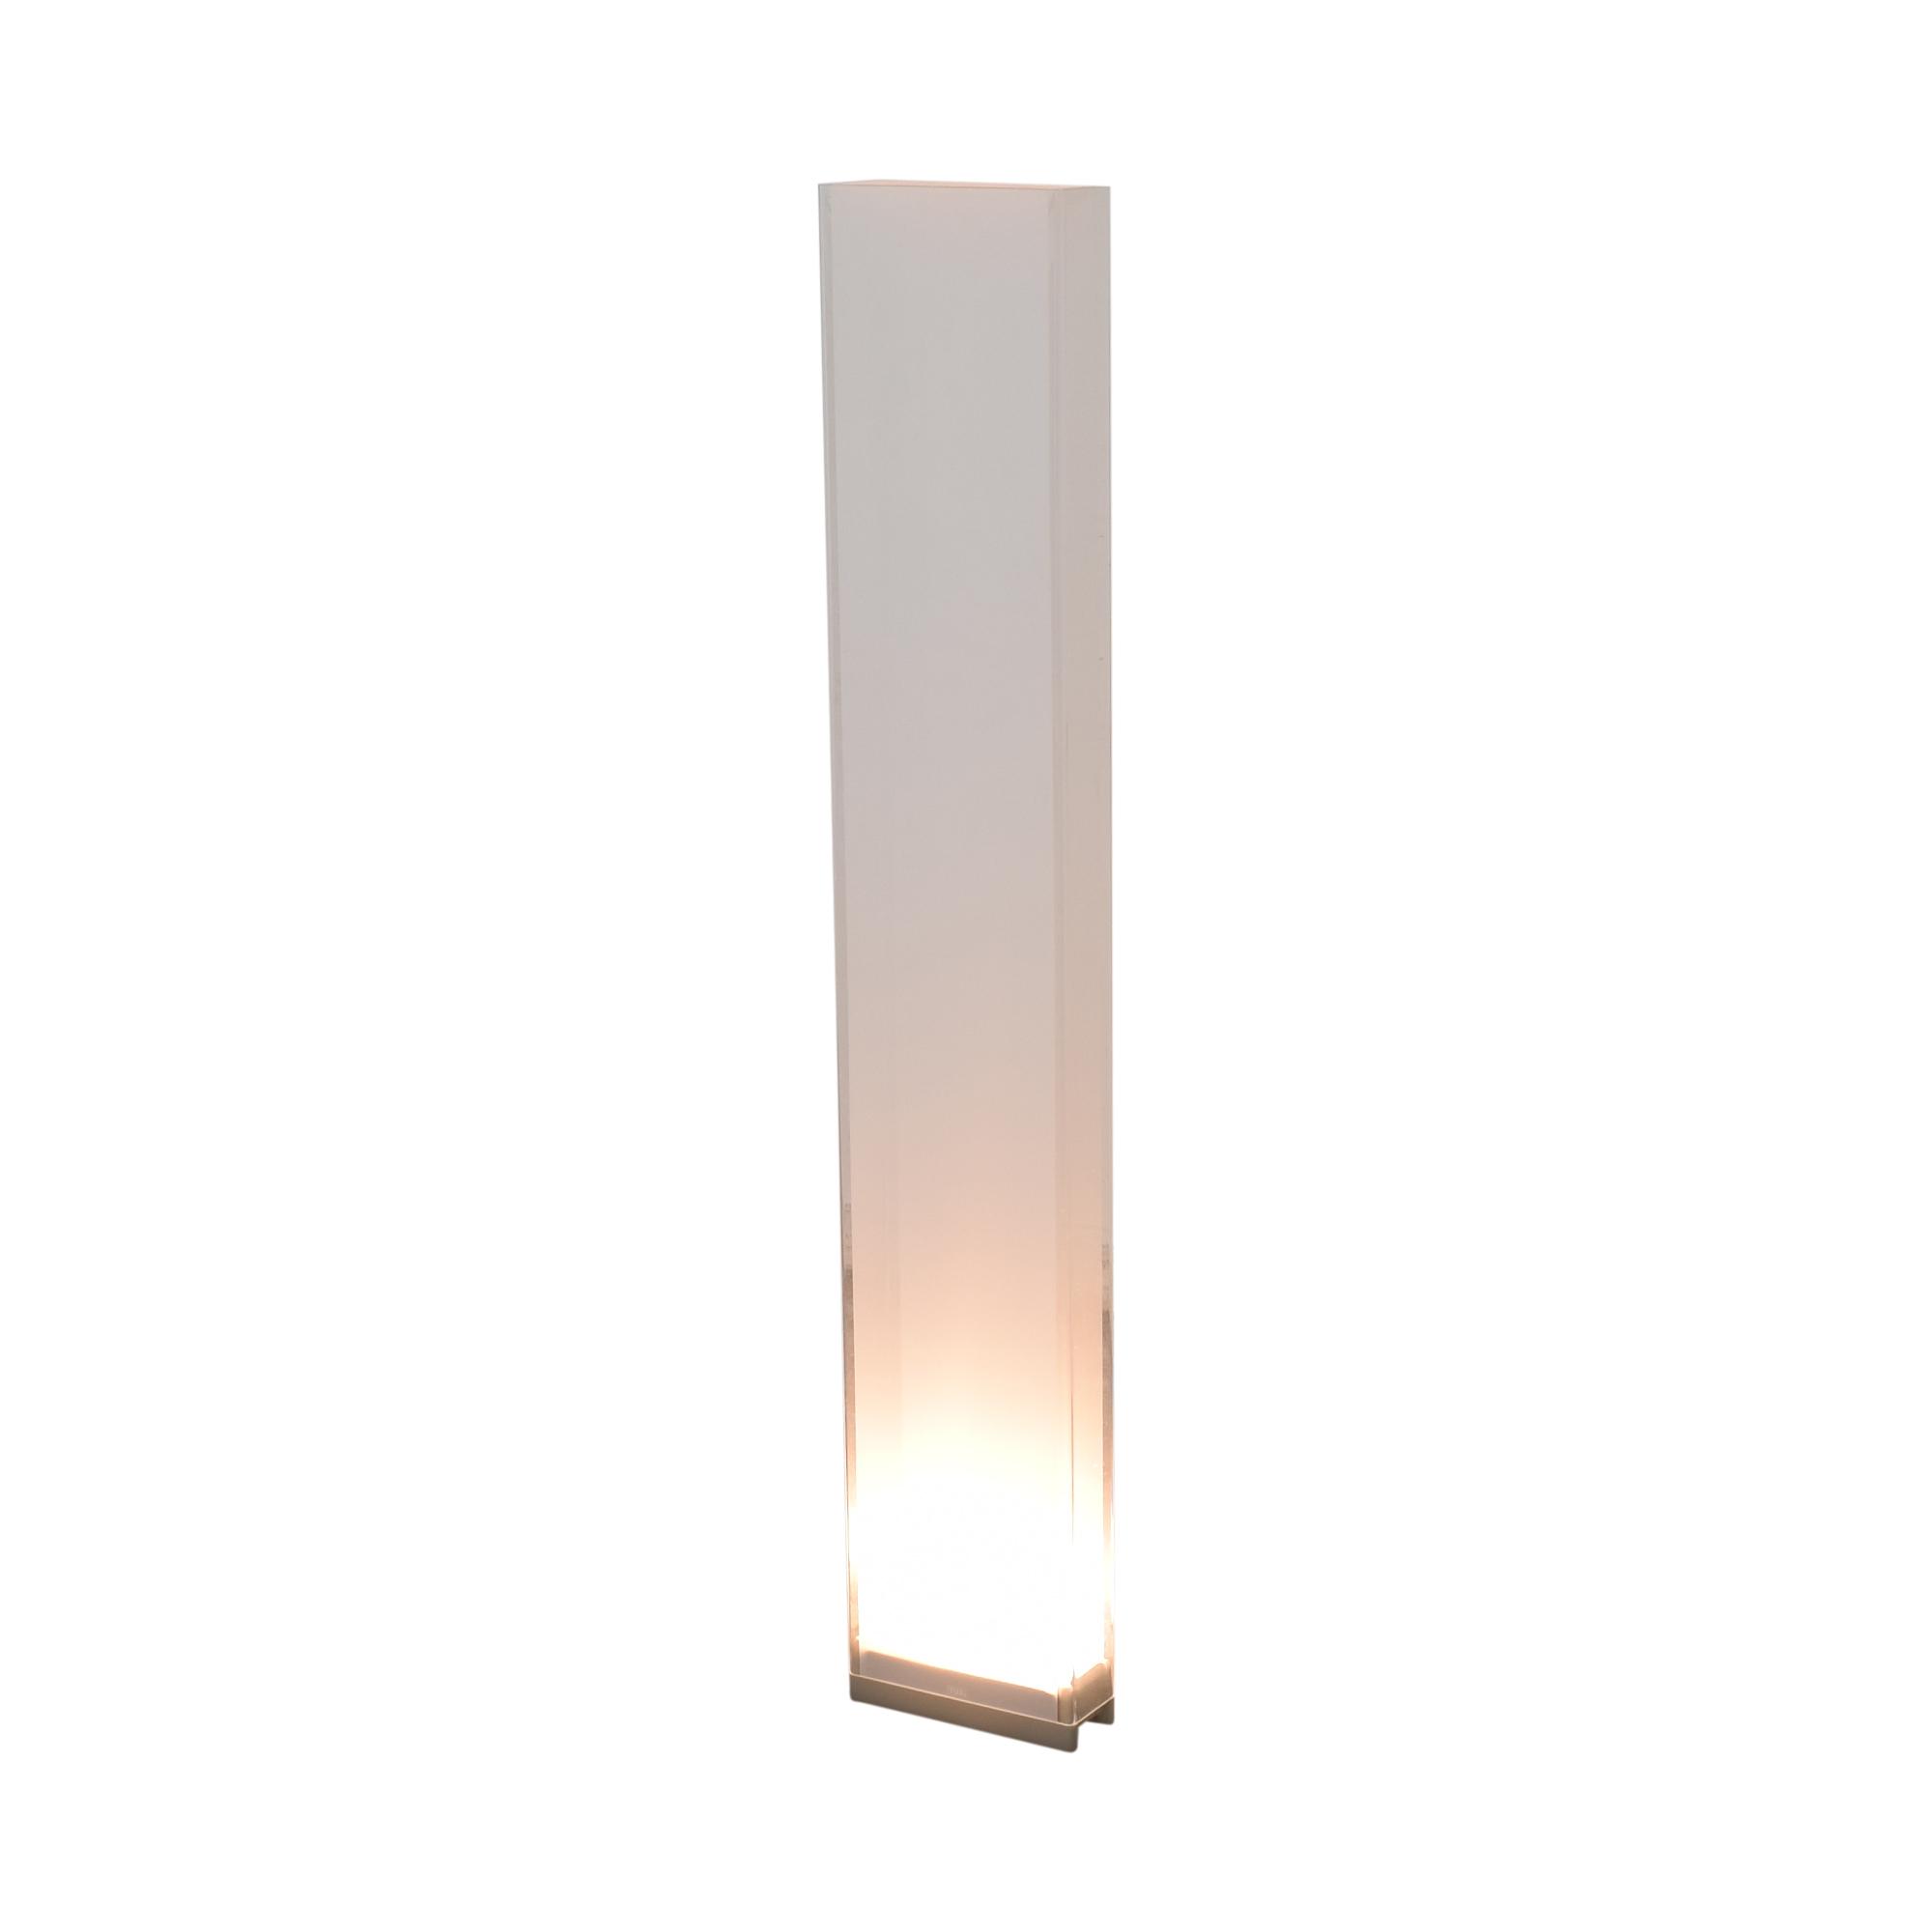 Pablo Designs Pablo Designs Cortina Modern Floor Lamp nyc